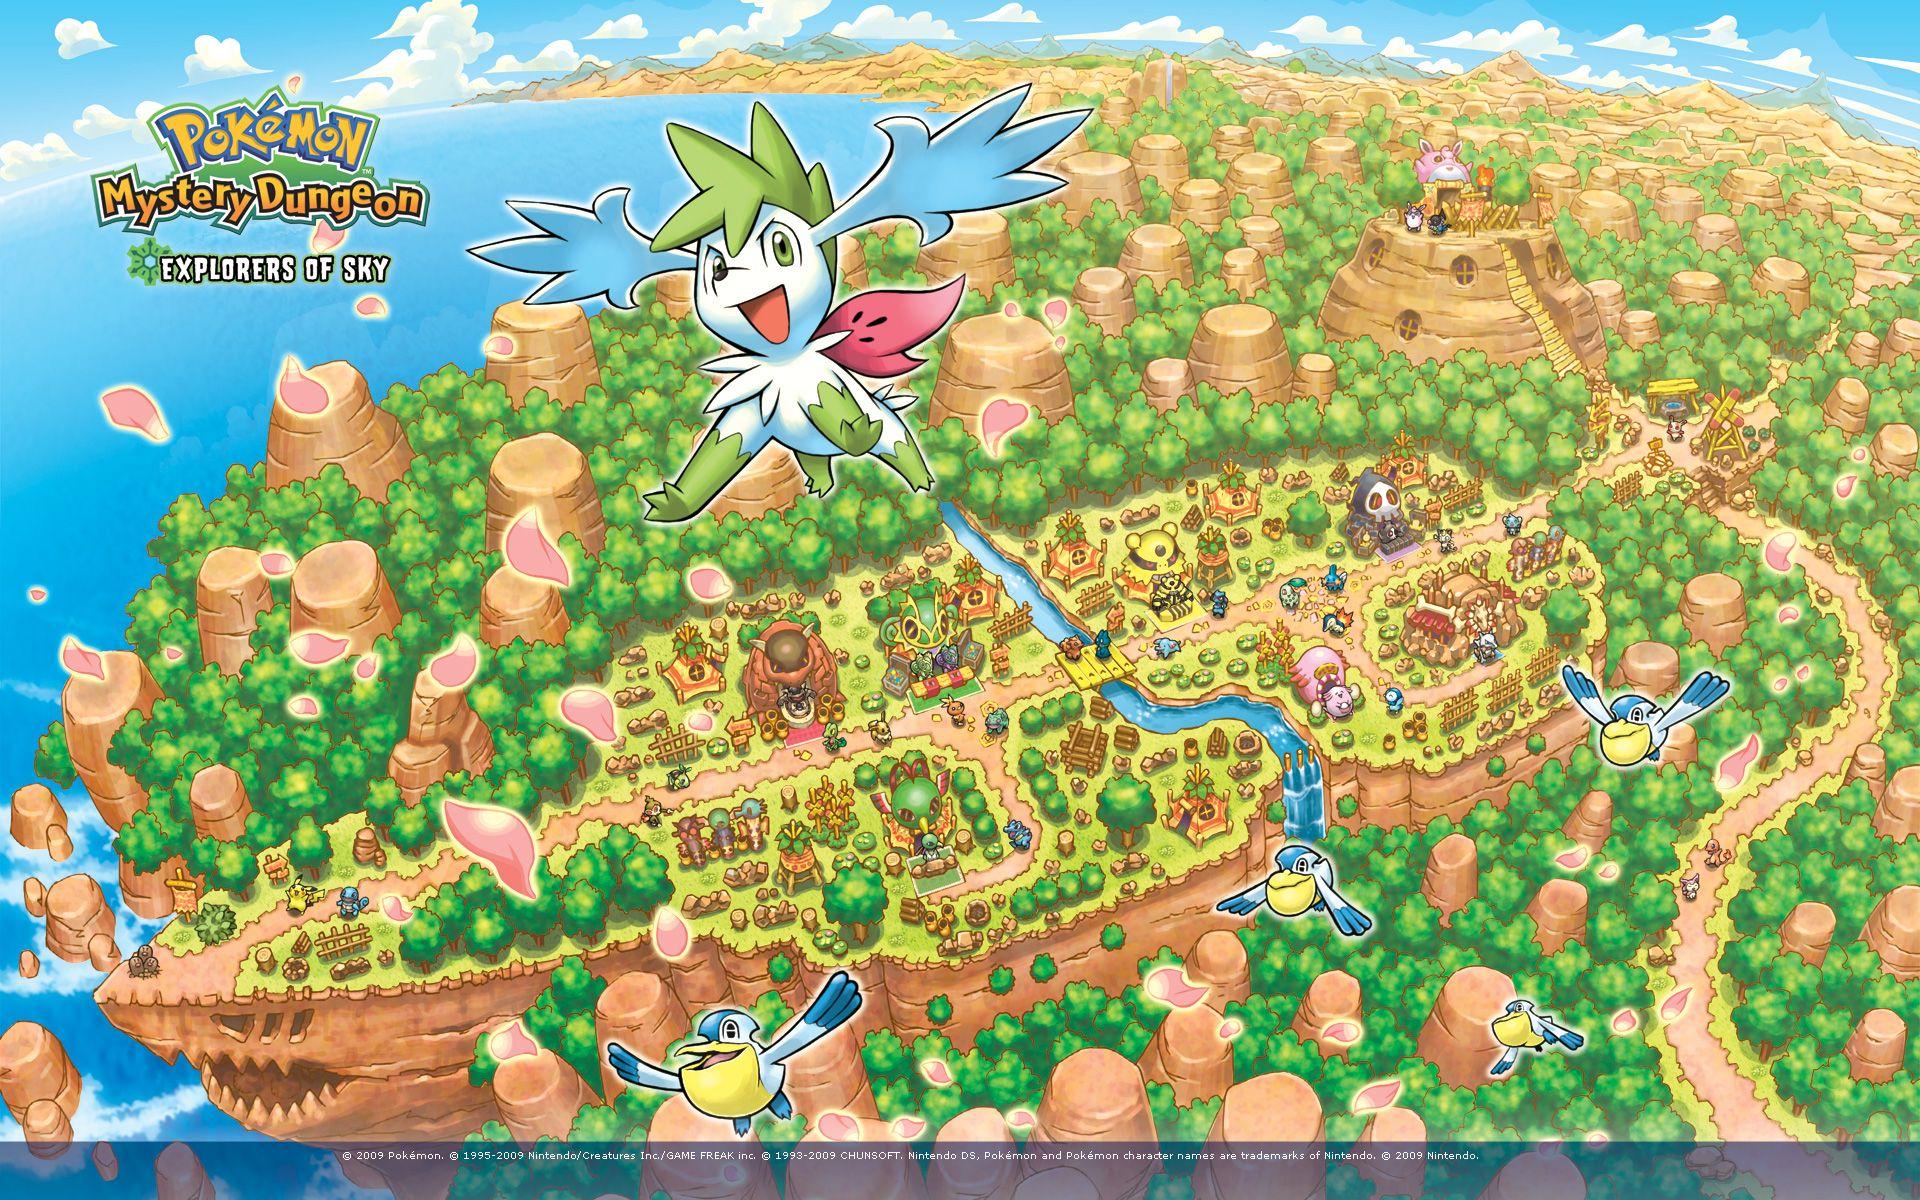 Pokemon Mystery Dungeon Explores Of The Sky Pokemon Website Pokemon Dungeon